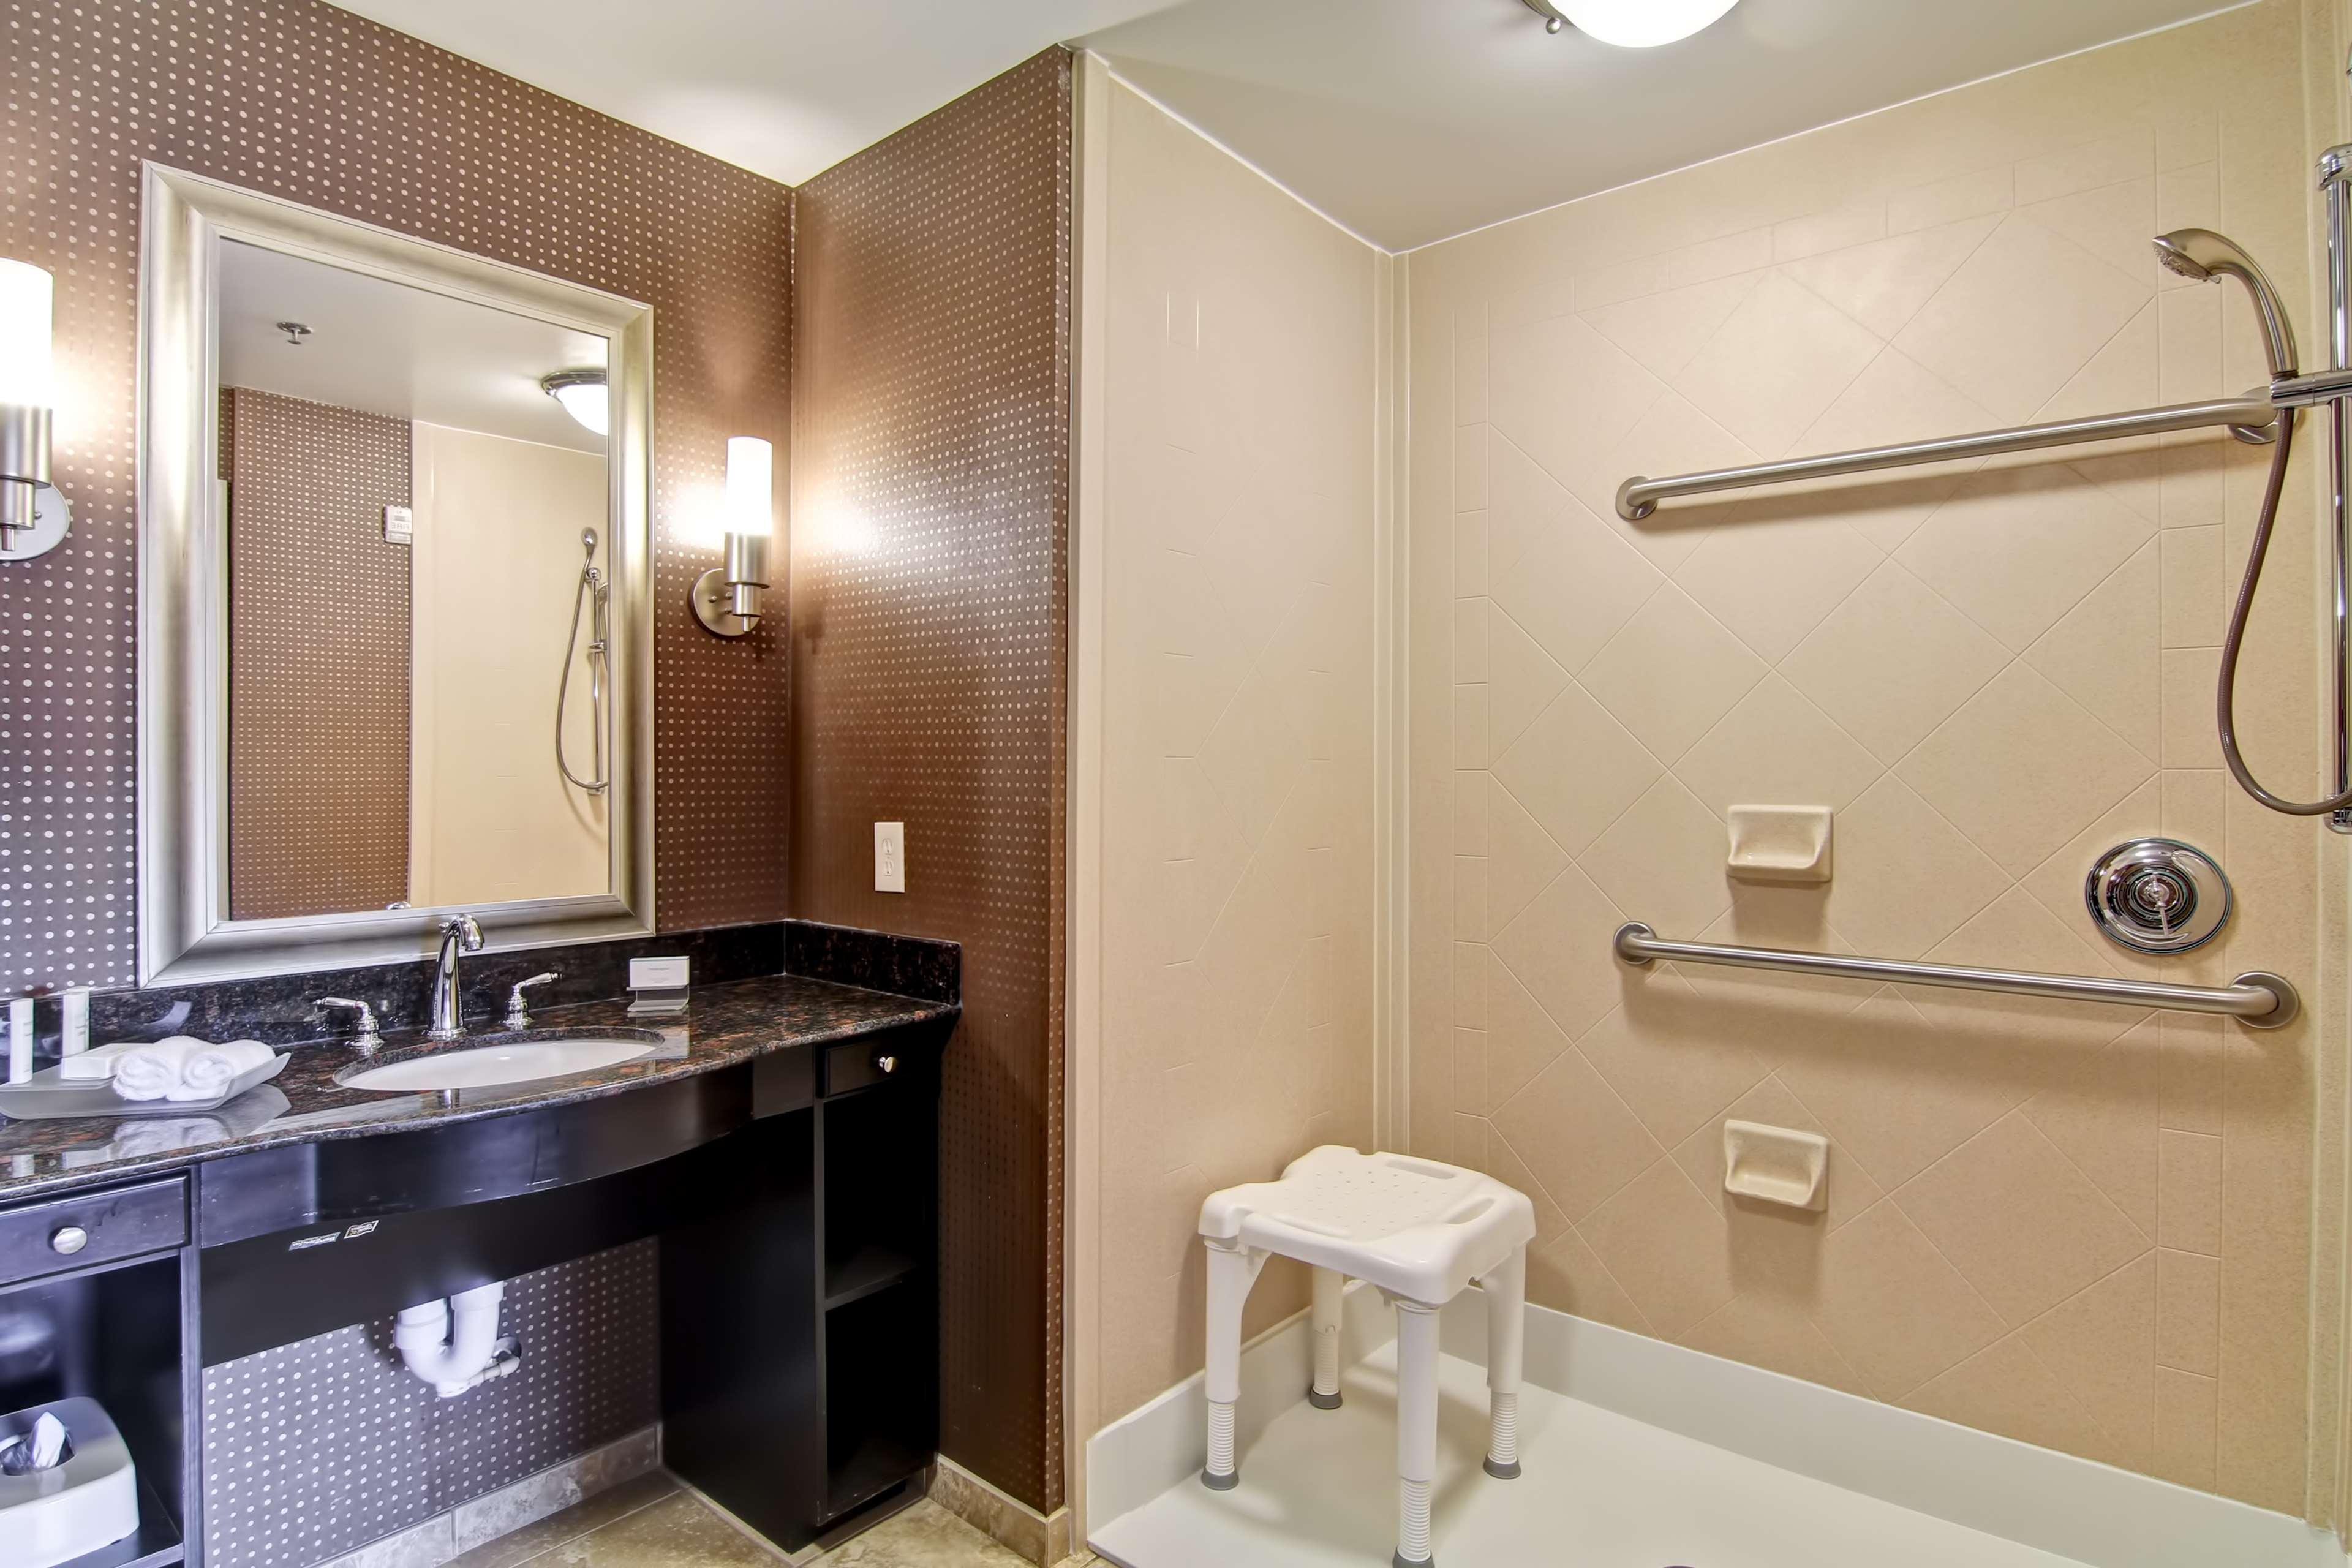 Homewood Suites by Hilton Cincinnati Airport South-Florence image 21